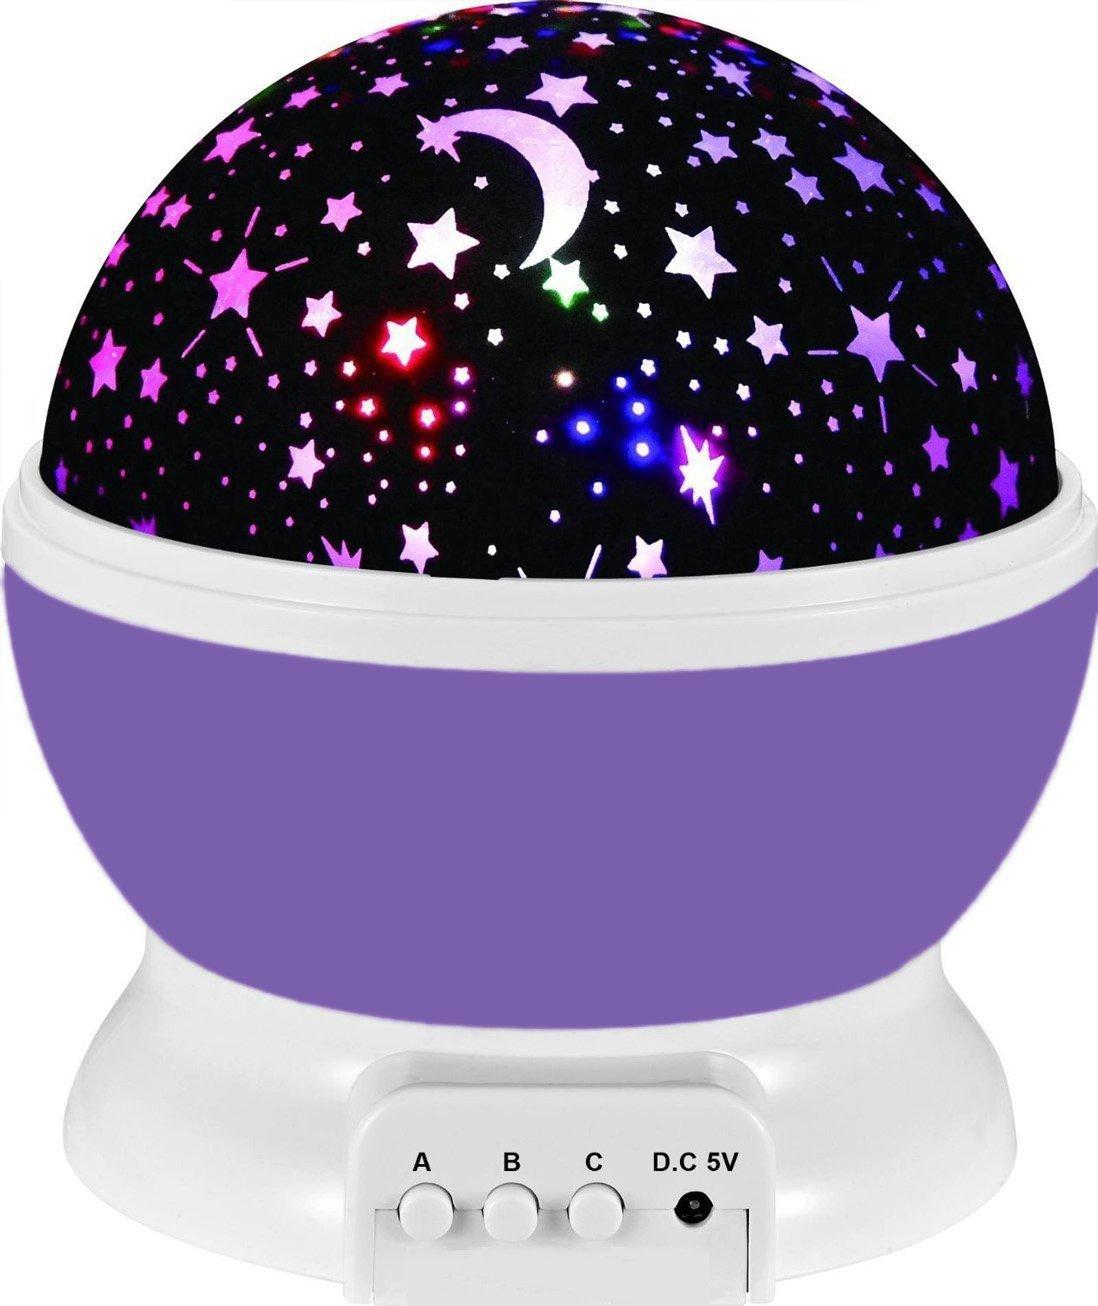 Baby Night Light Lamp Uinstone Moon Star Projector 360 Degree R.